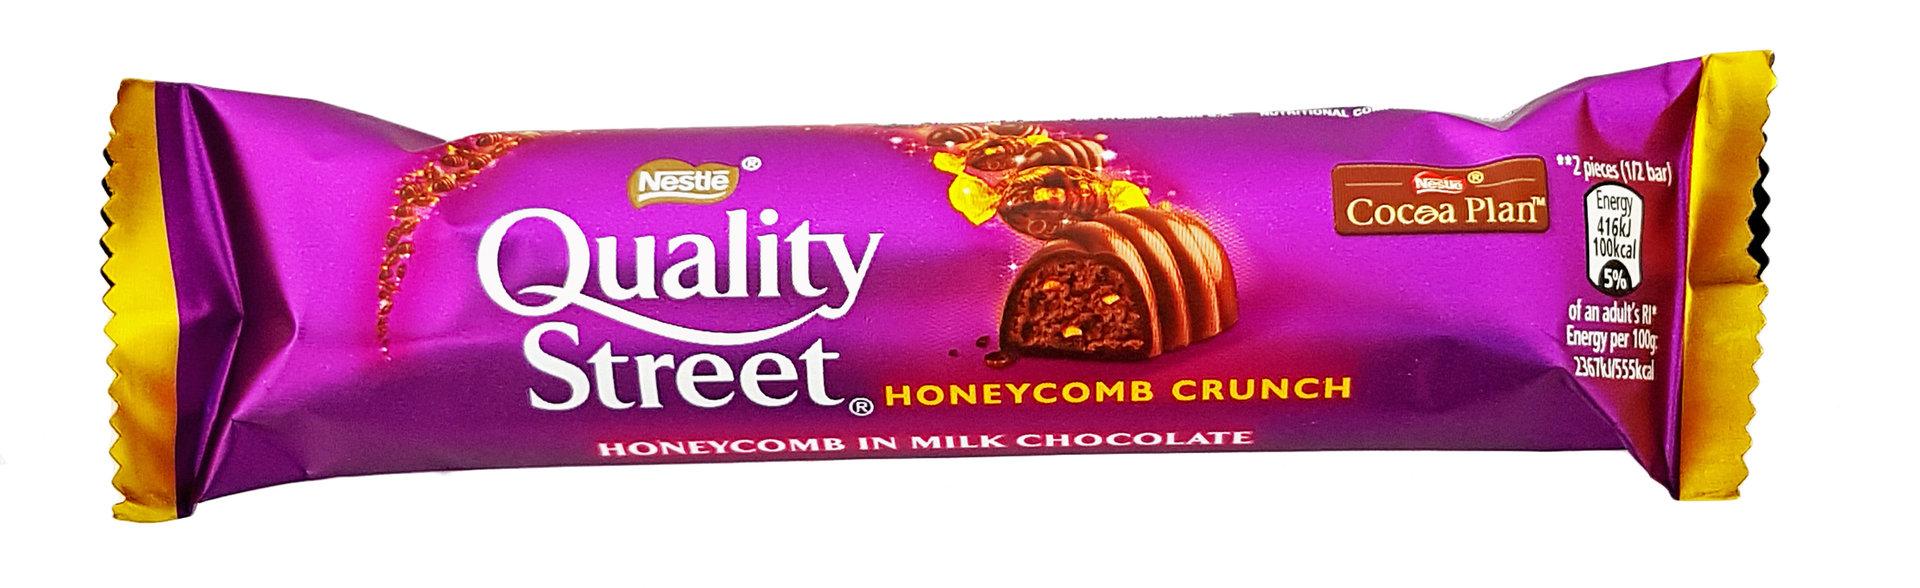 Nestle Quality Street Honeycomb Crunch Chocolate Bar, 35g - Piece ...